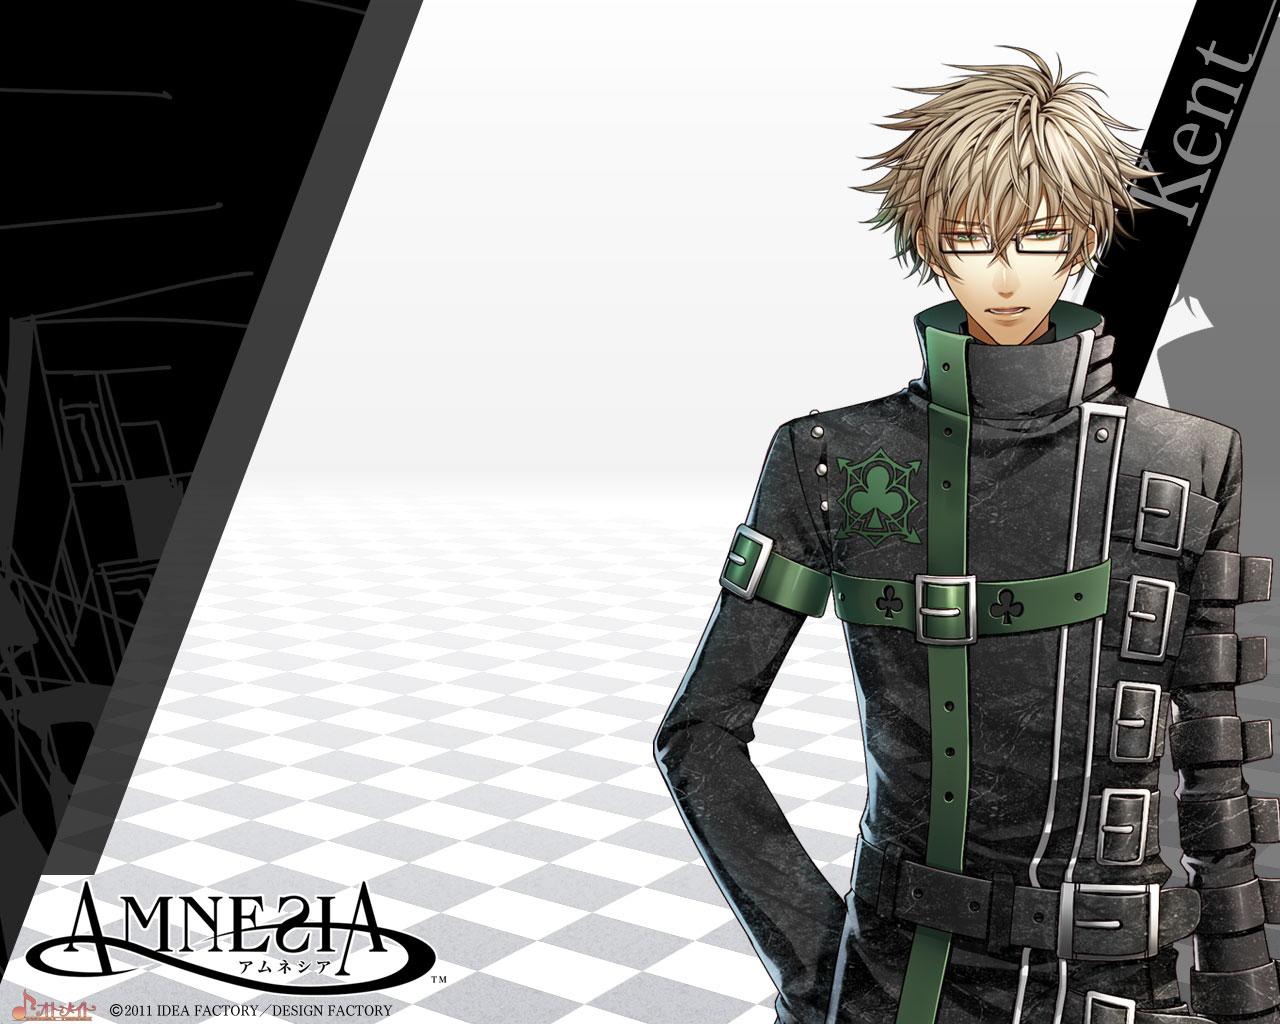 Amnesia Anime Wallpaper Kent Amnesia Wallpaper 517279 Zerochan Anime Image Board